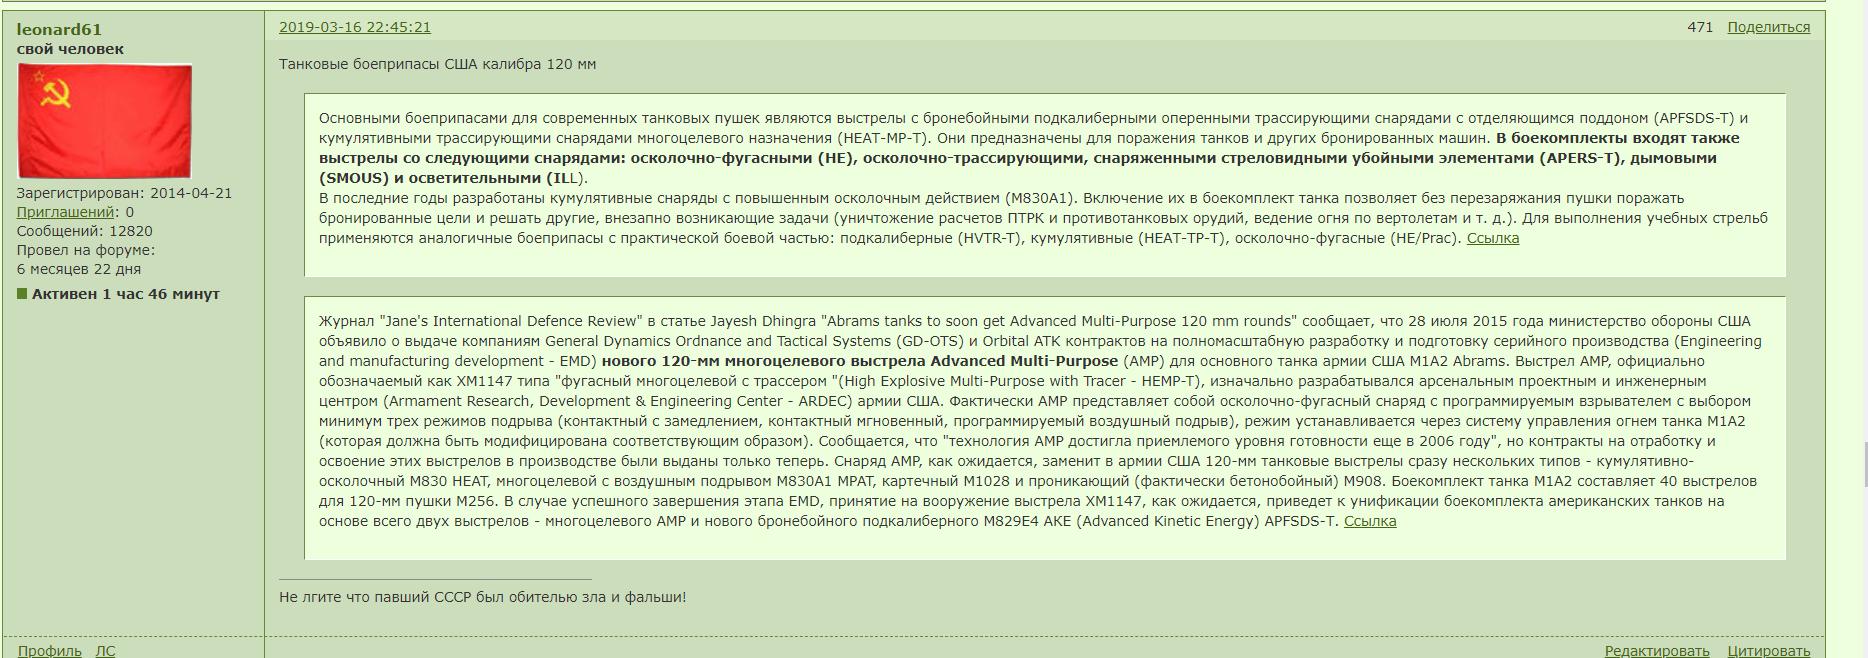 https://images.vfl.ru/ii/1553504980/7b326d93/25909472.png